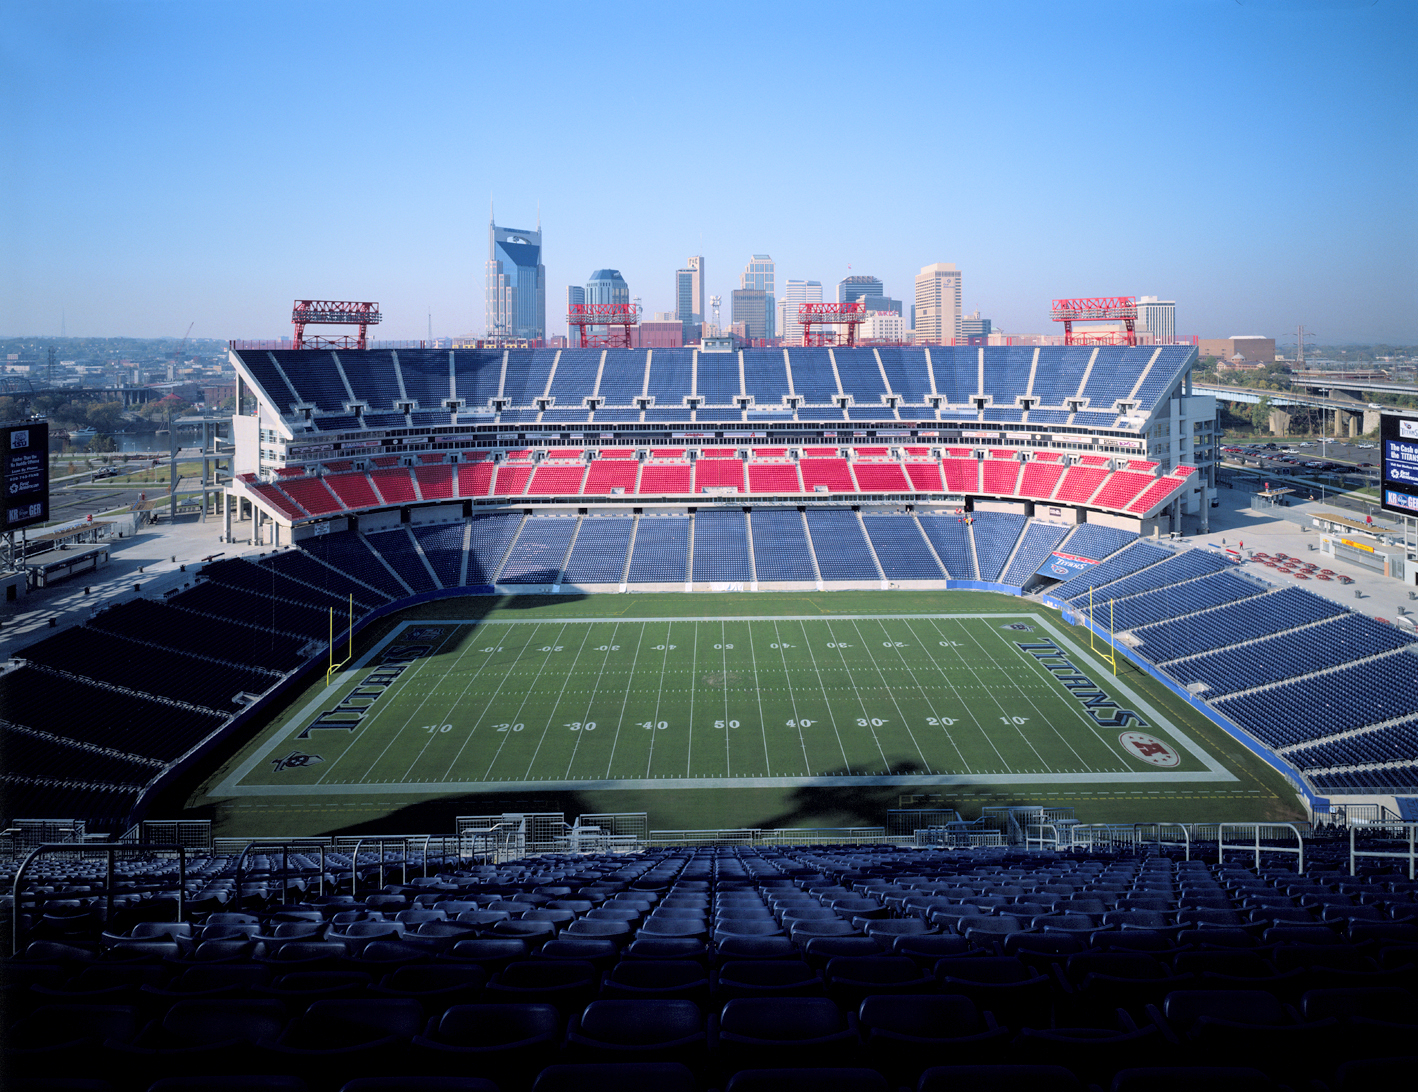 NFL Titans Coliseum   Nashville, Tennessee